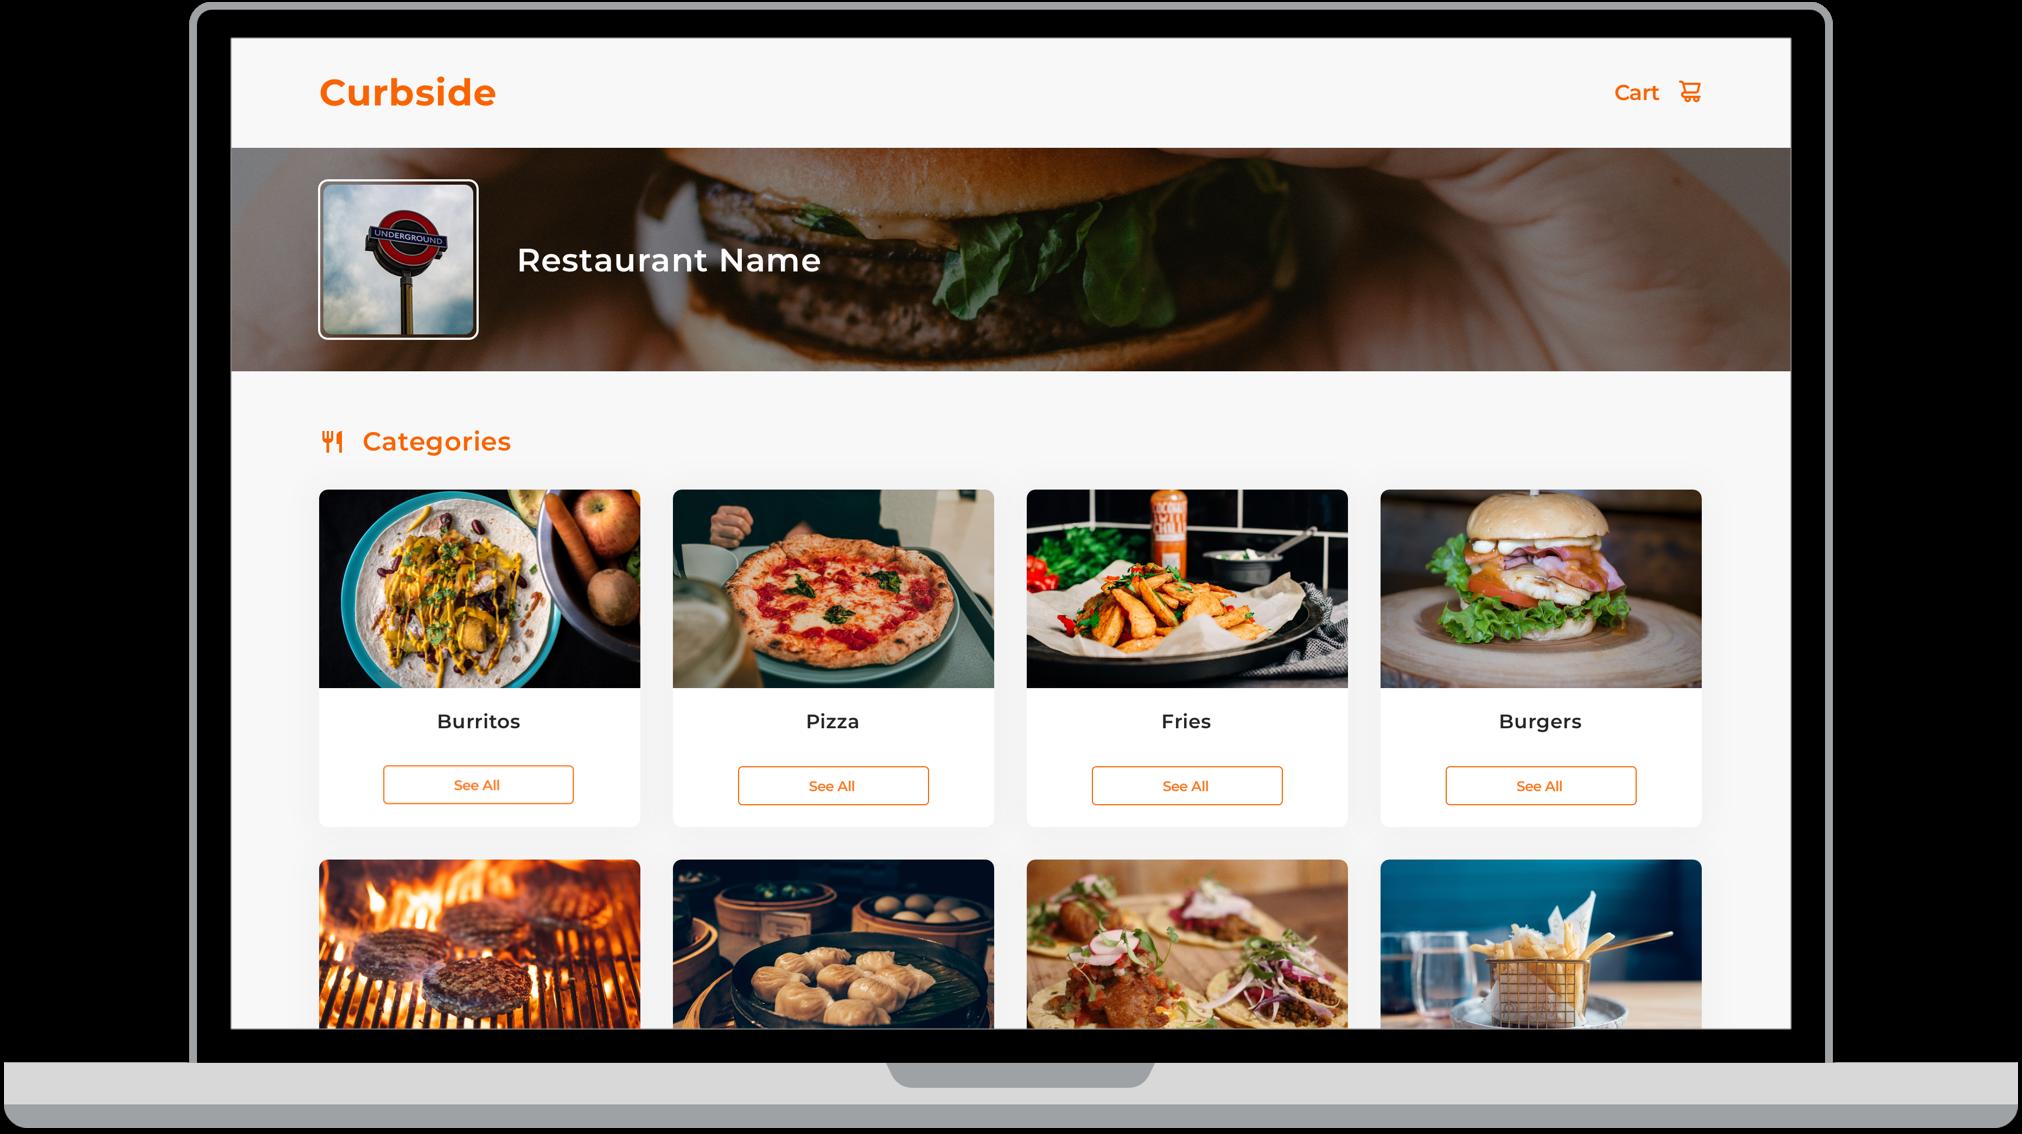 curbside-web-app-user-interface